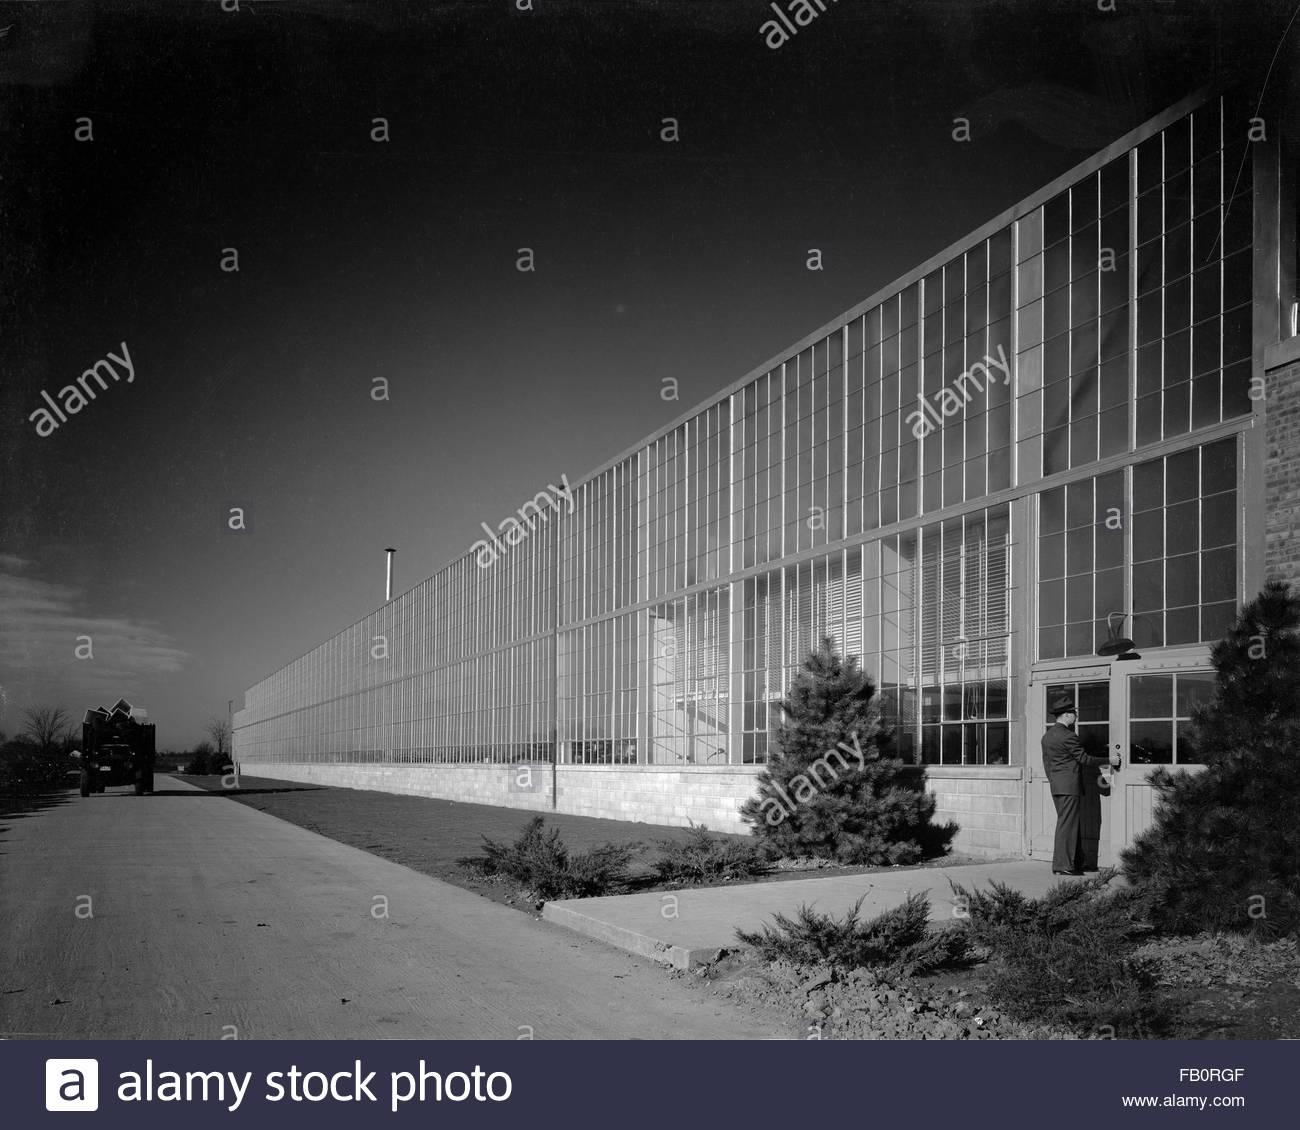 Toledo Scale plant in Ohio, 1939 Dec. 27. Exterior, Toledo scale plant. - Stock Image